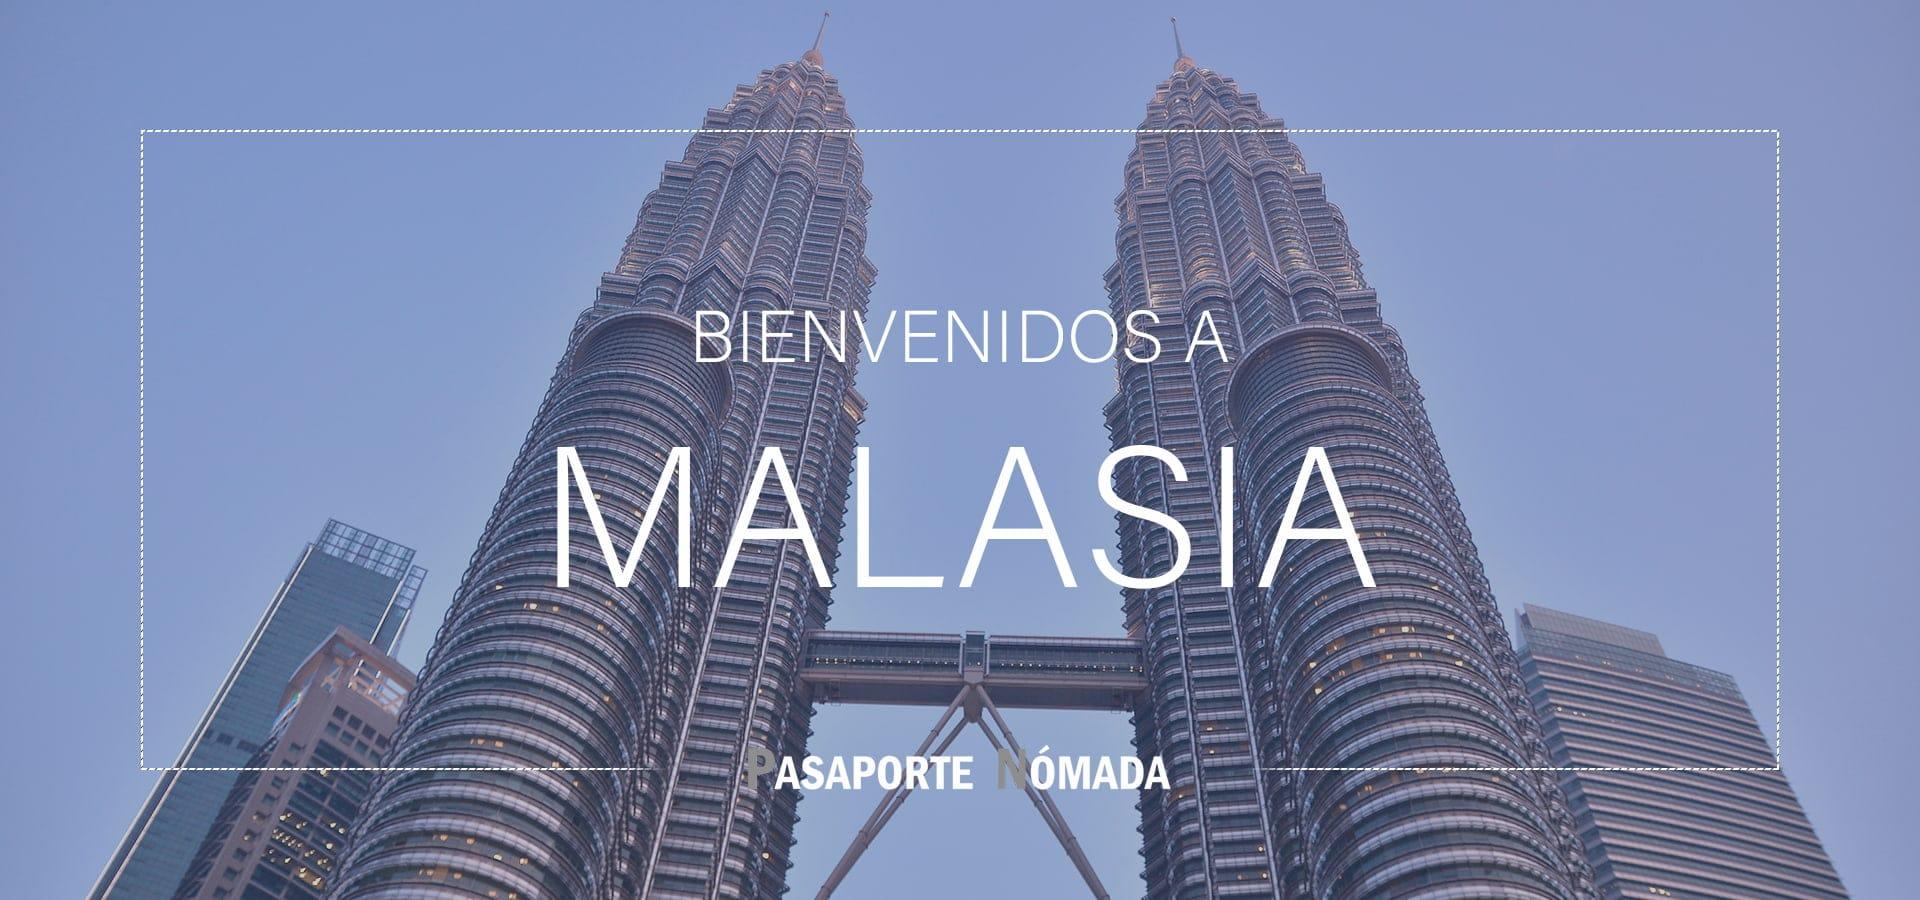 destinos para viajar malasia